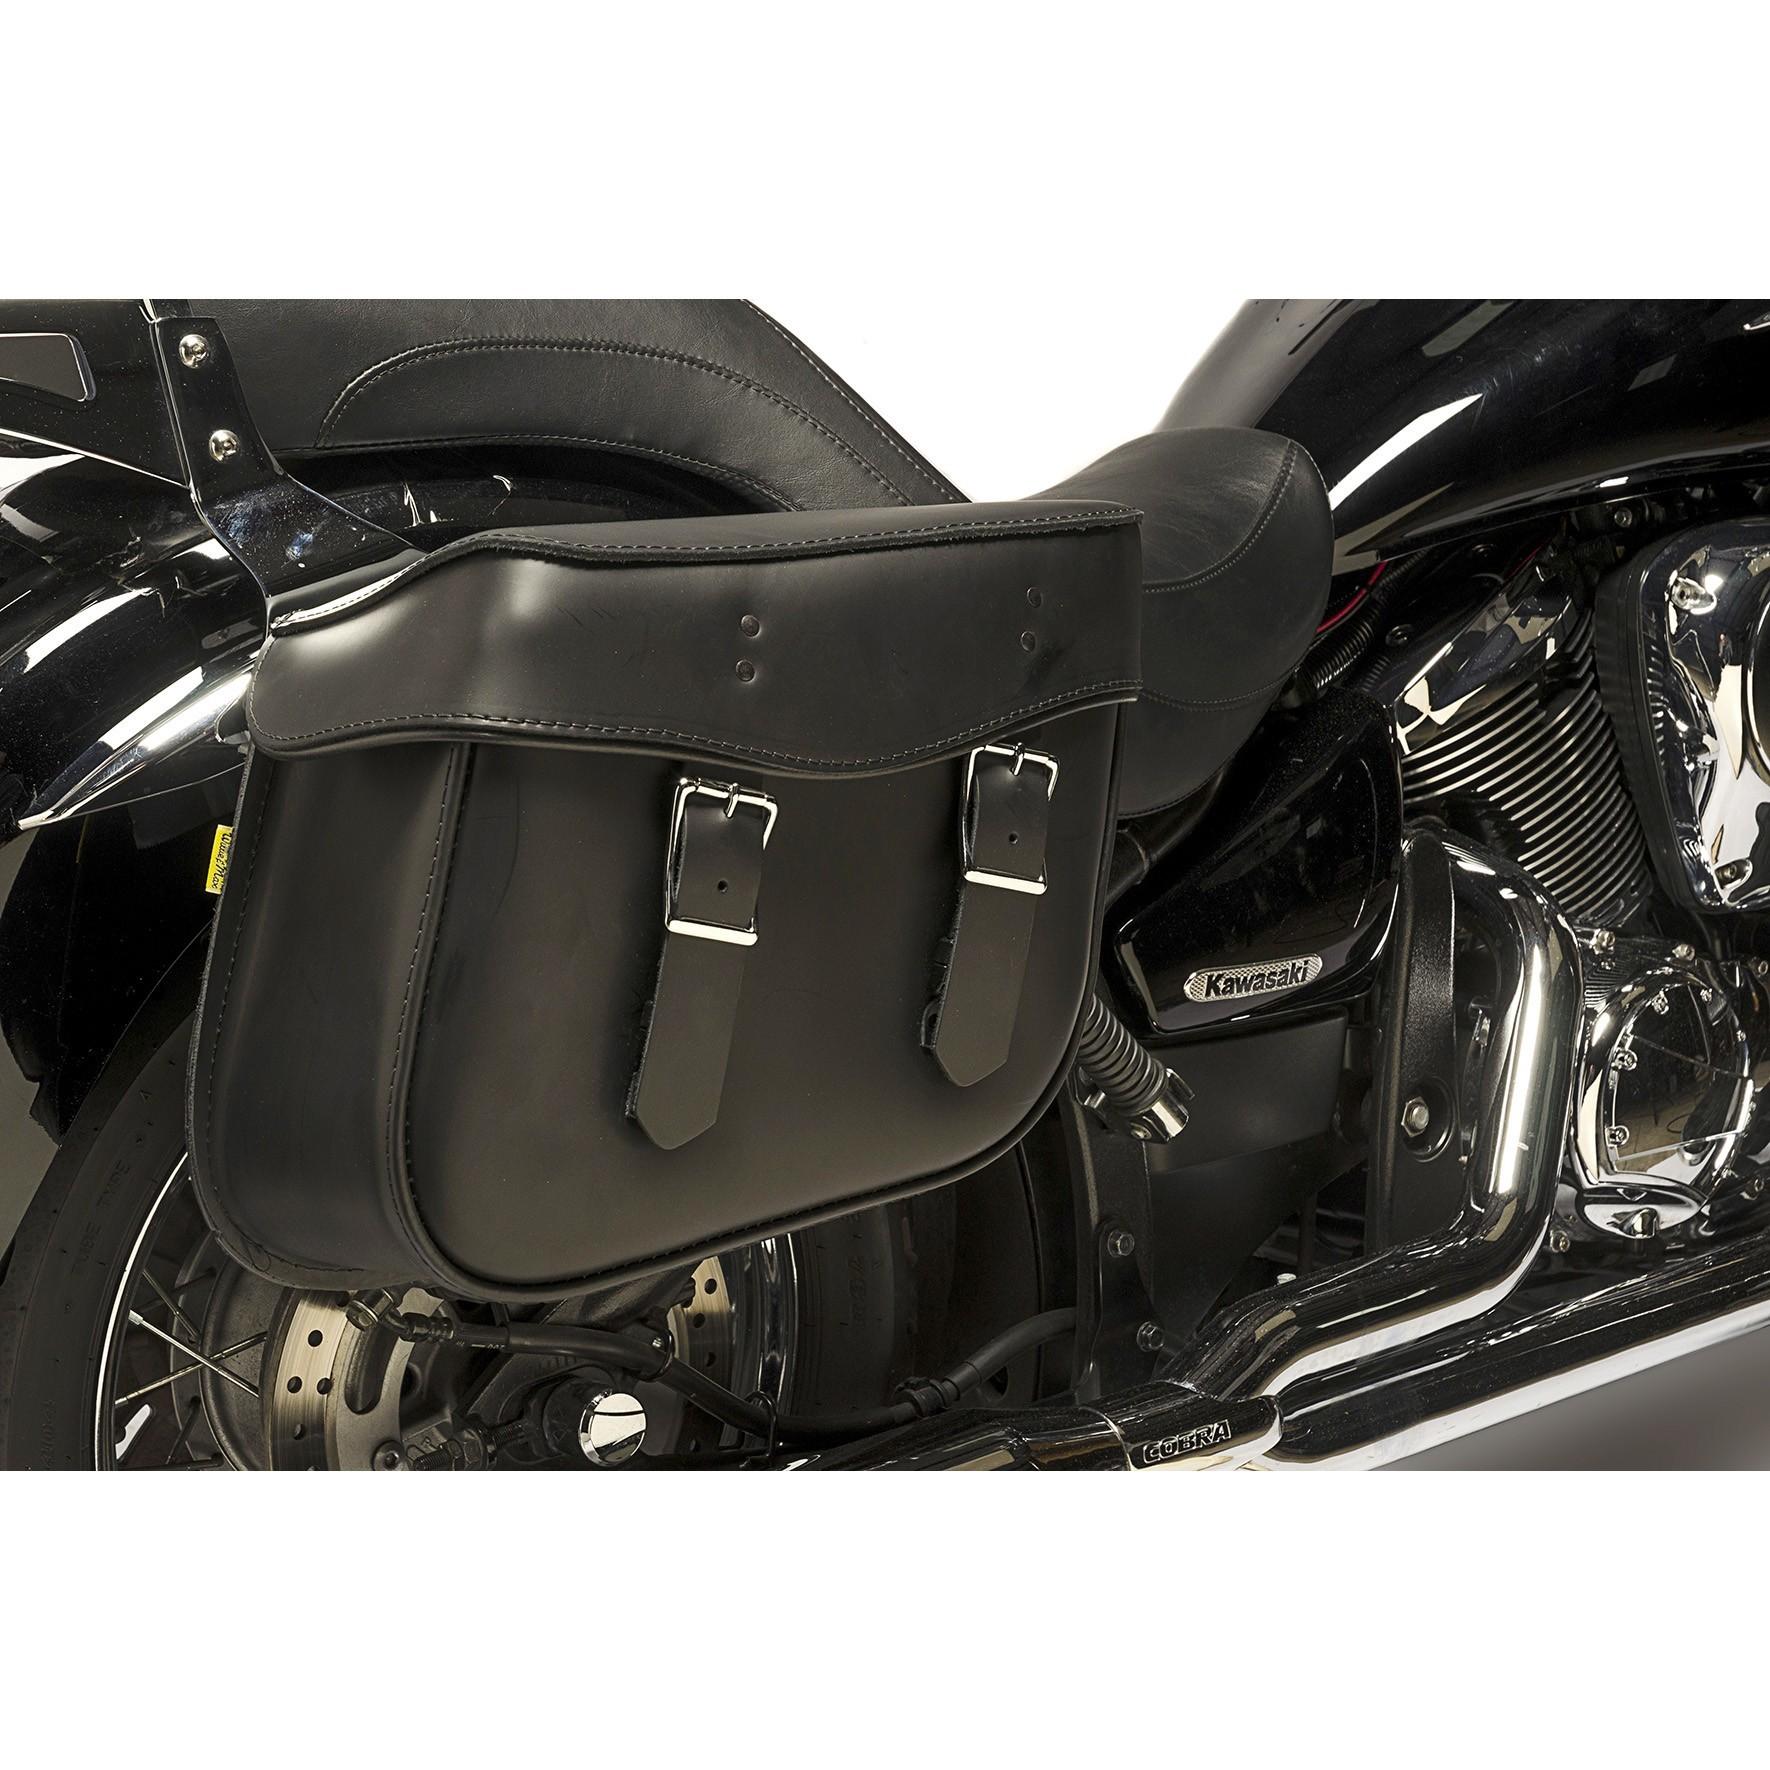 Willie and Max Montana Leather Saddlebags on a Kawasaki Vulcan 900